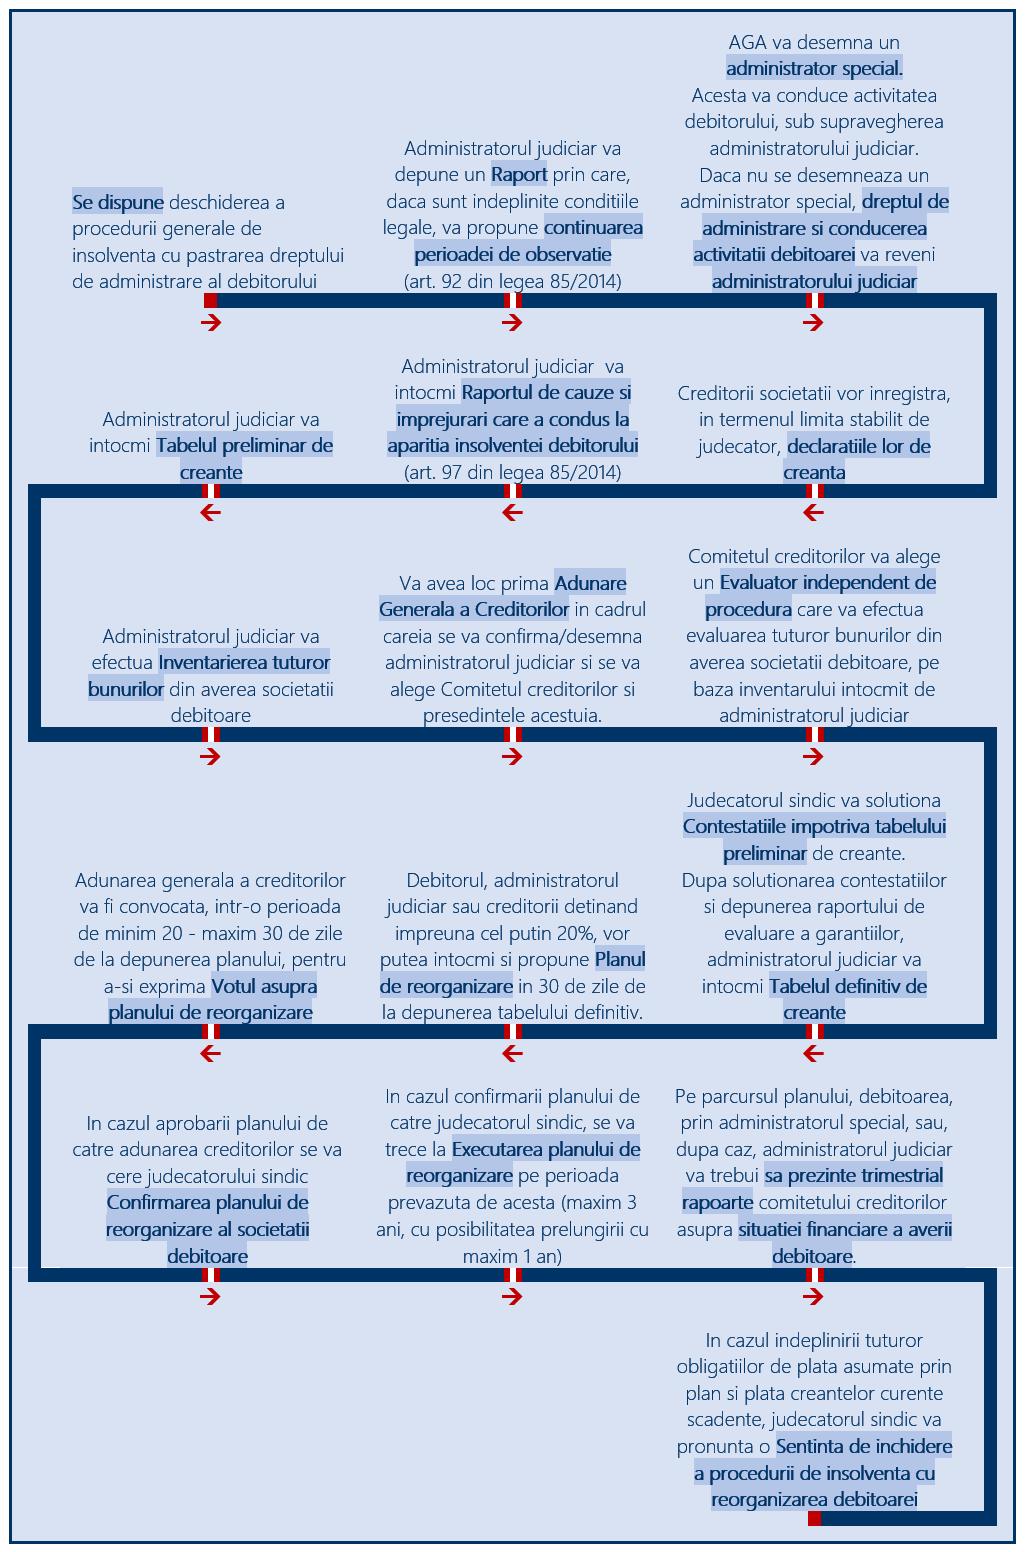 Administrarea judiciara - pașii parcursi in procedura insolventei finalizata cu reorganizare